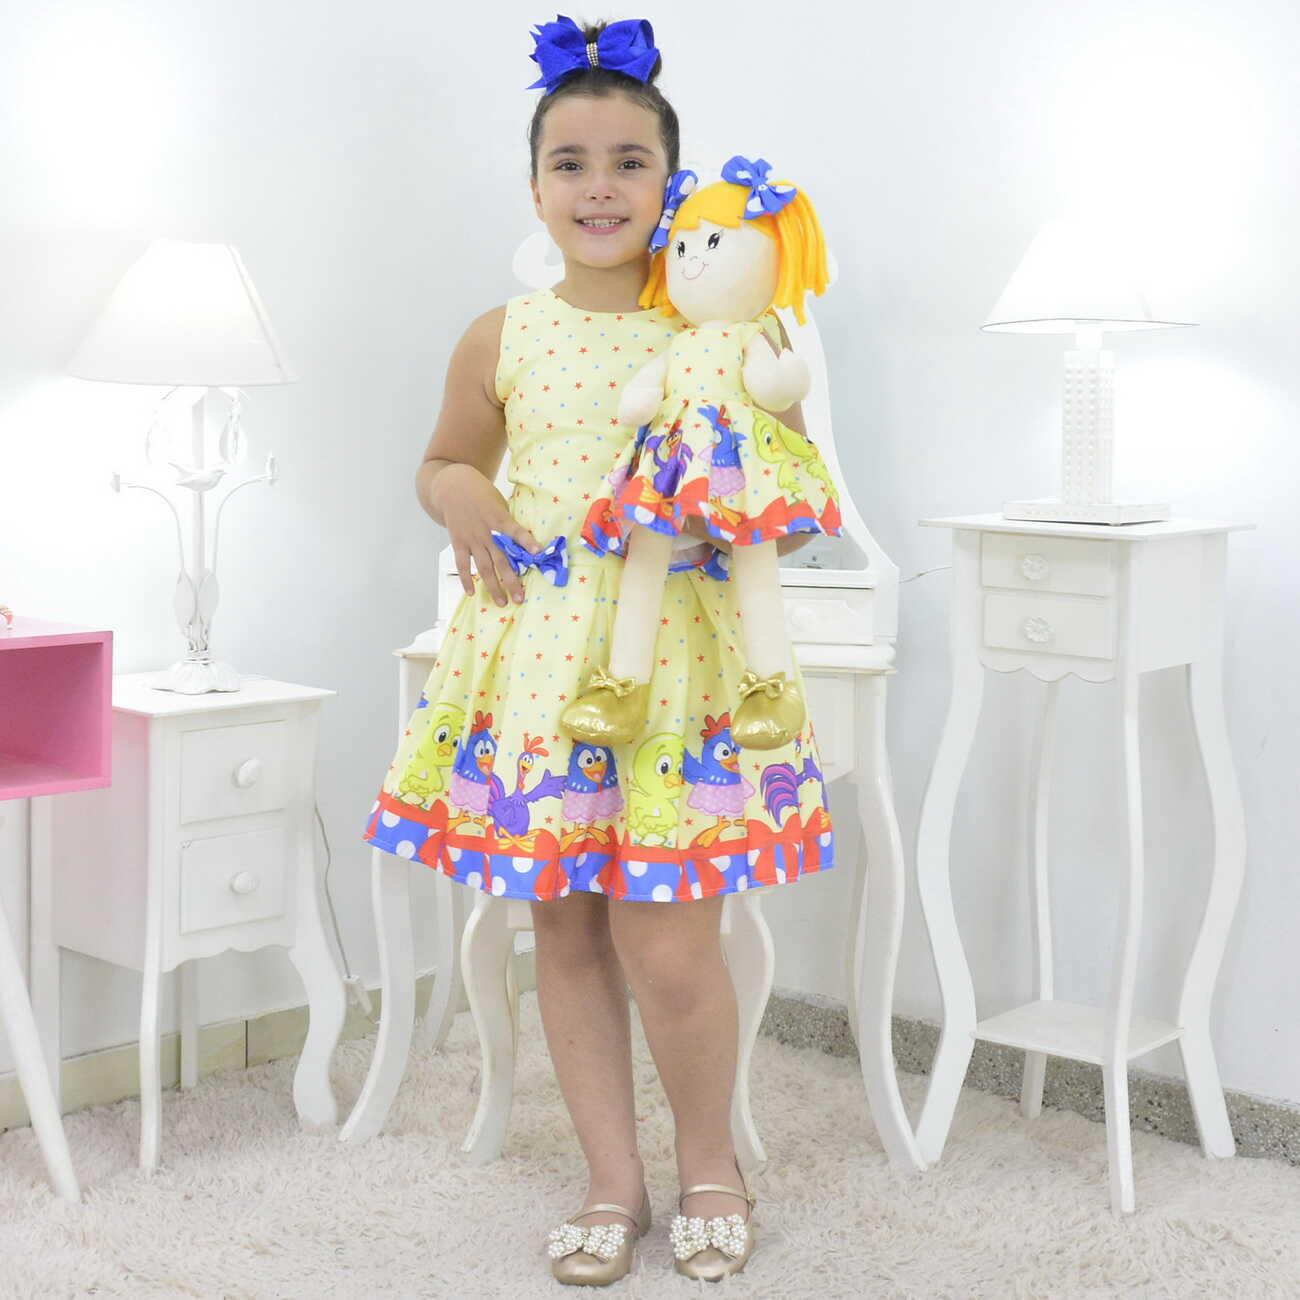 Tal Menina Tal Boneca Helo - Vestido Galinha Pintadinha Candy